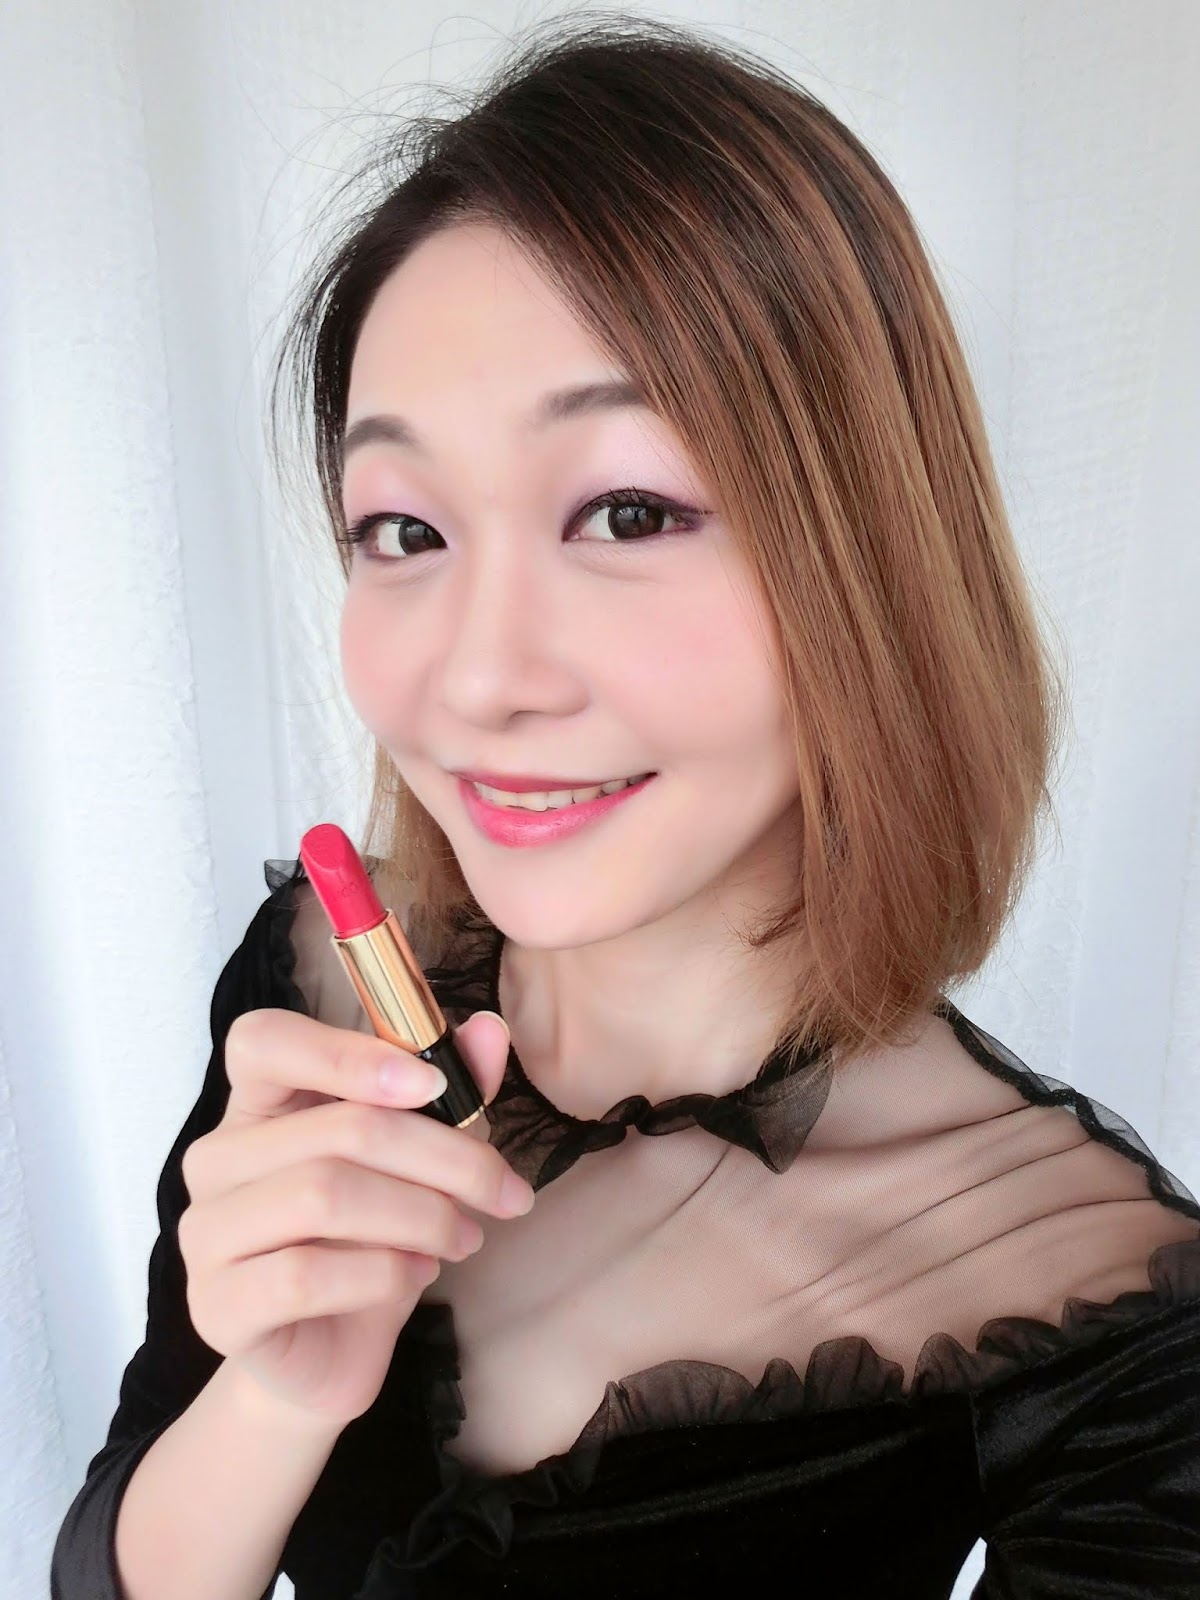 e97aa944b7 Beautylife HK - 設計屬於你的專屬唇膏 Lancome 個人化刻名服務 - 設計 ...